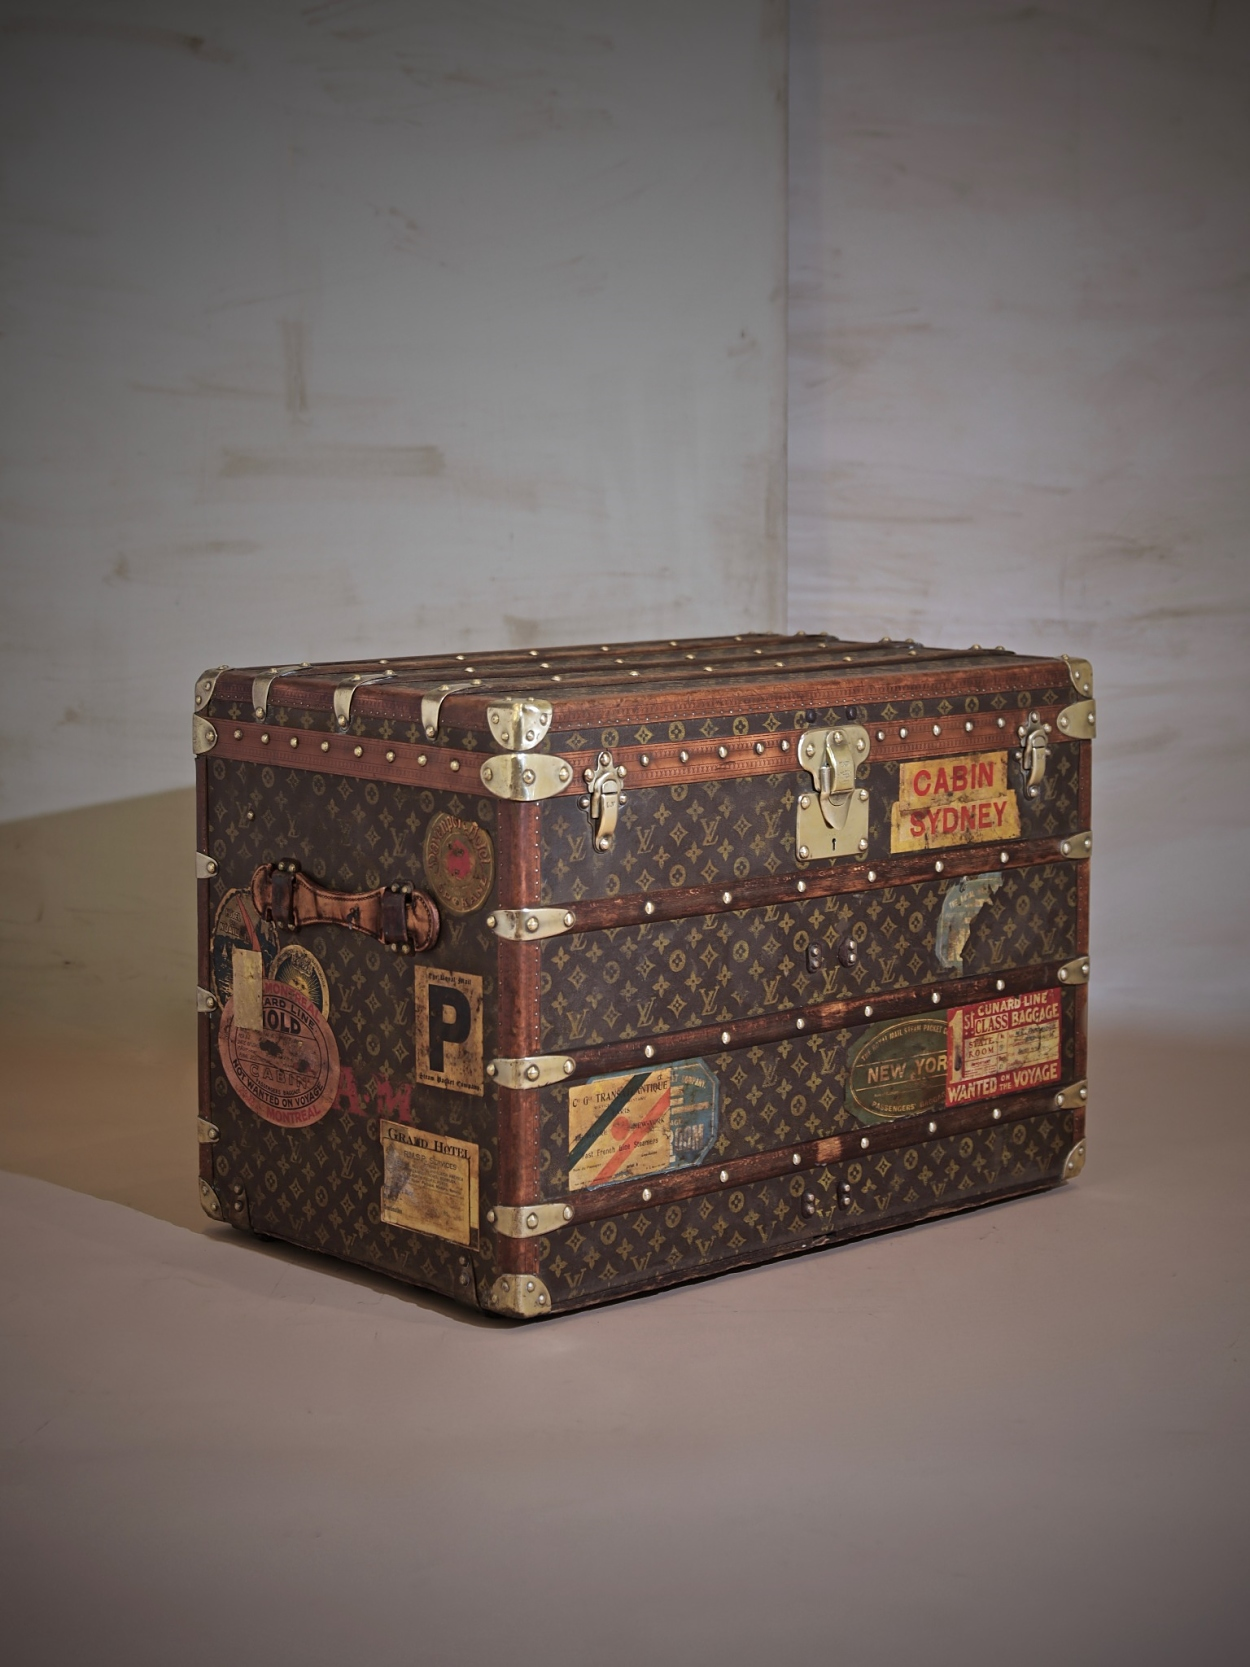 l-traveled-trunk-louis-vuitton-thumbnail-product-5709-1